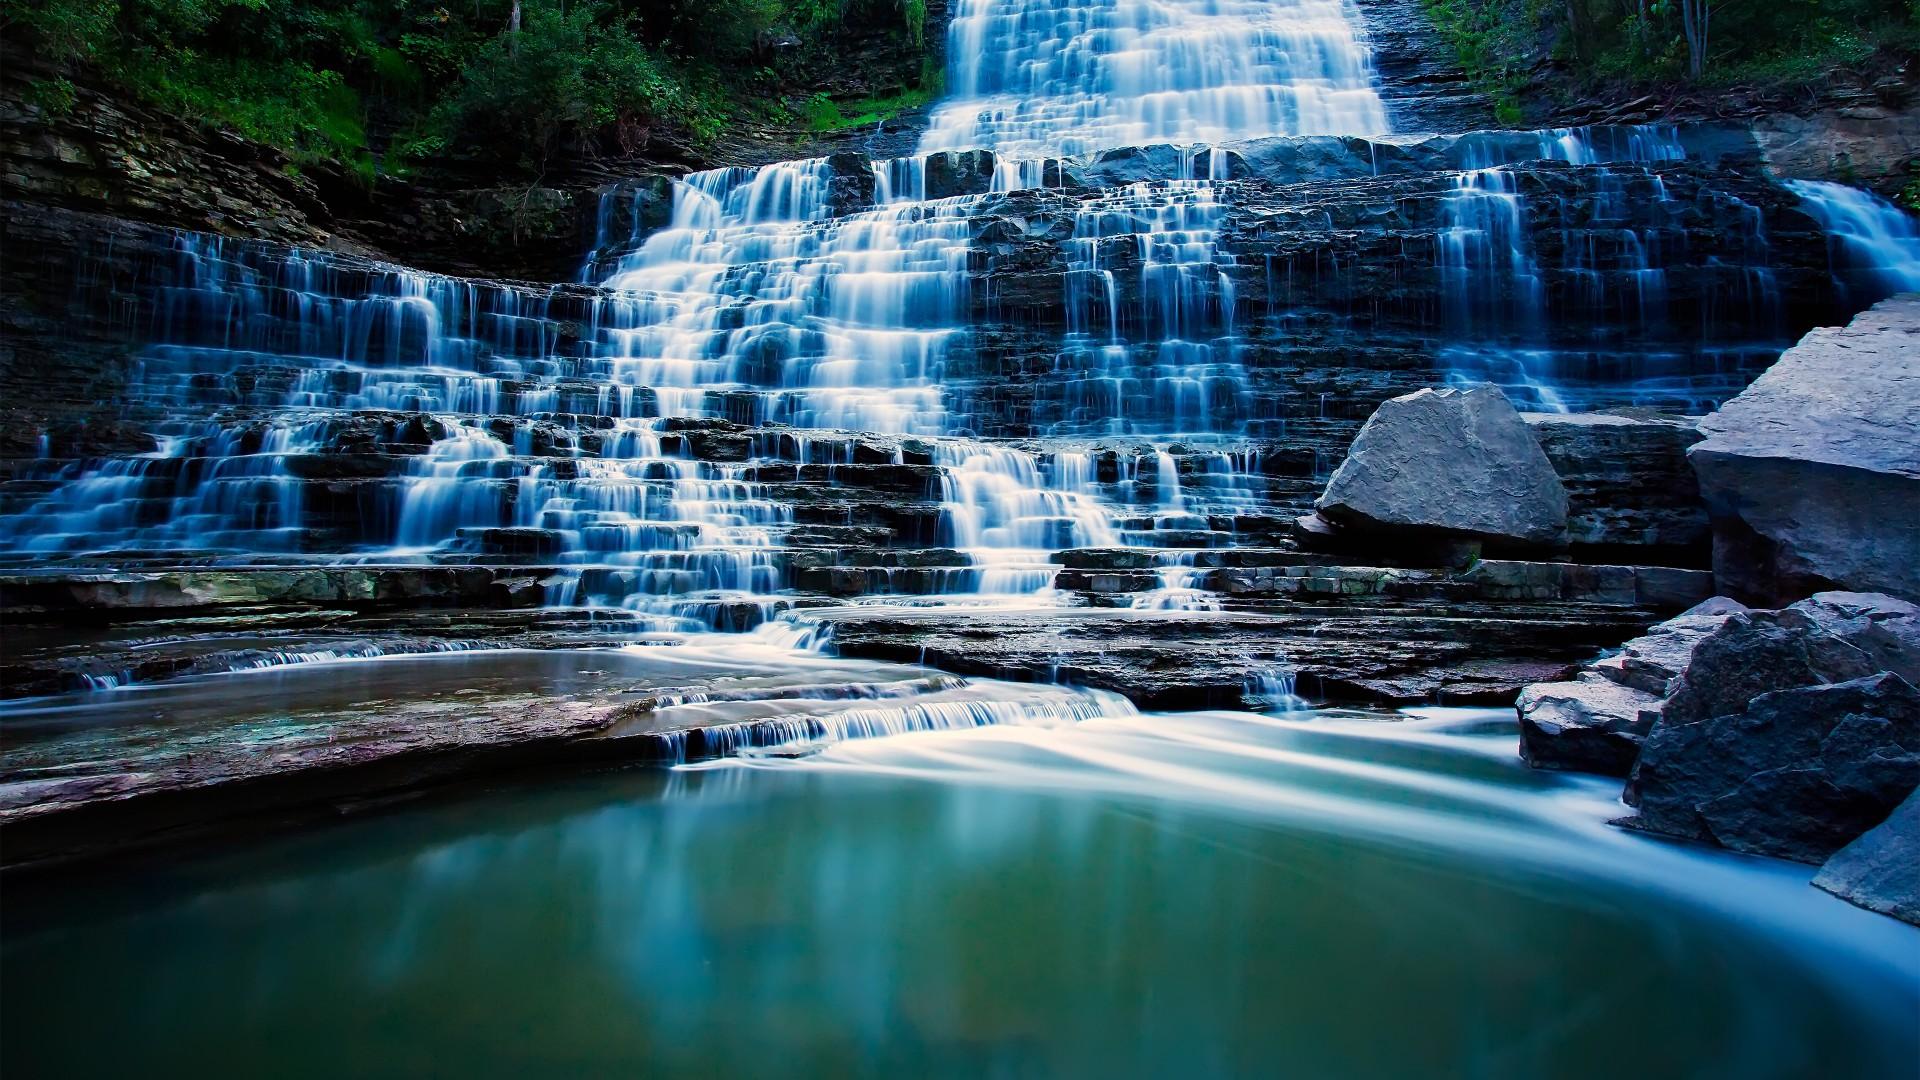 Wallpaper Pongour Waterfall 4k Hd Wallpaper Falls